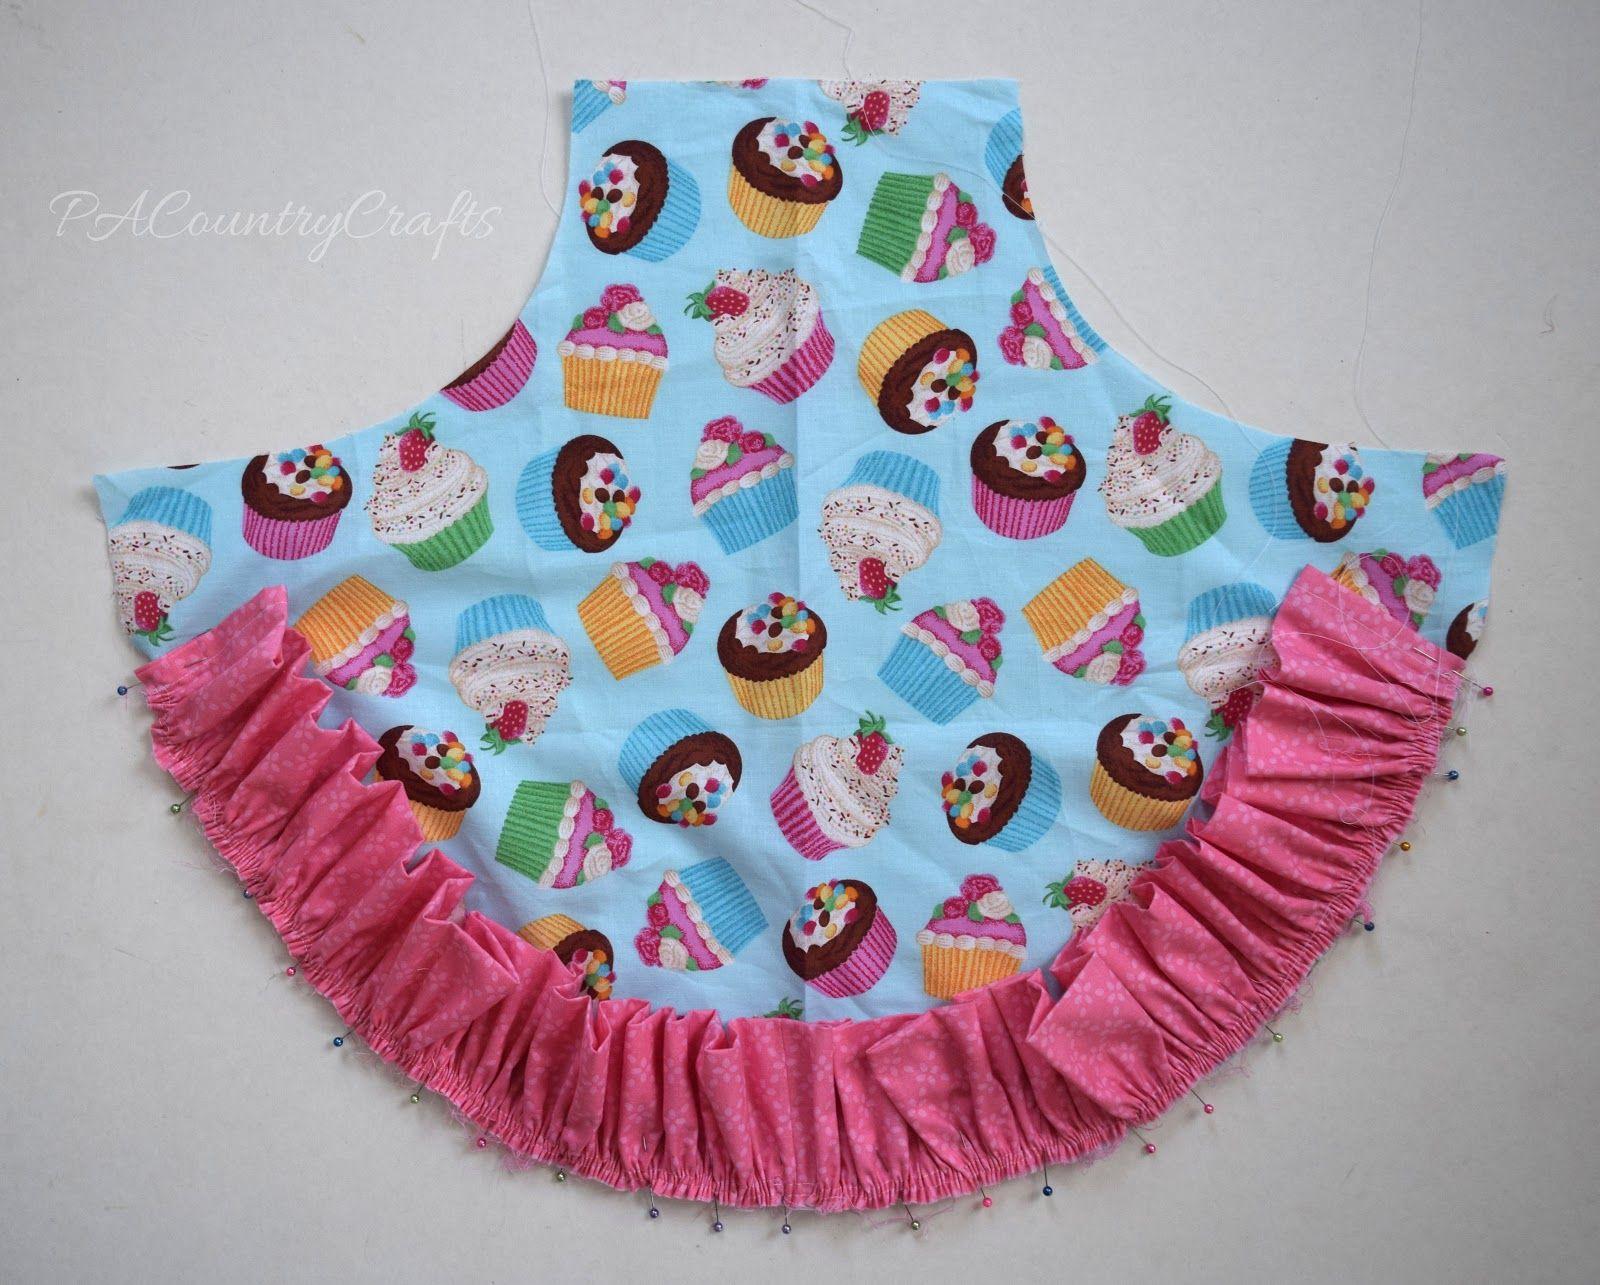 Girls Ruffle Apron Pattern and Tutorial | sewing | Pinterest ...